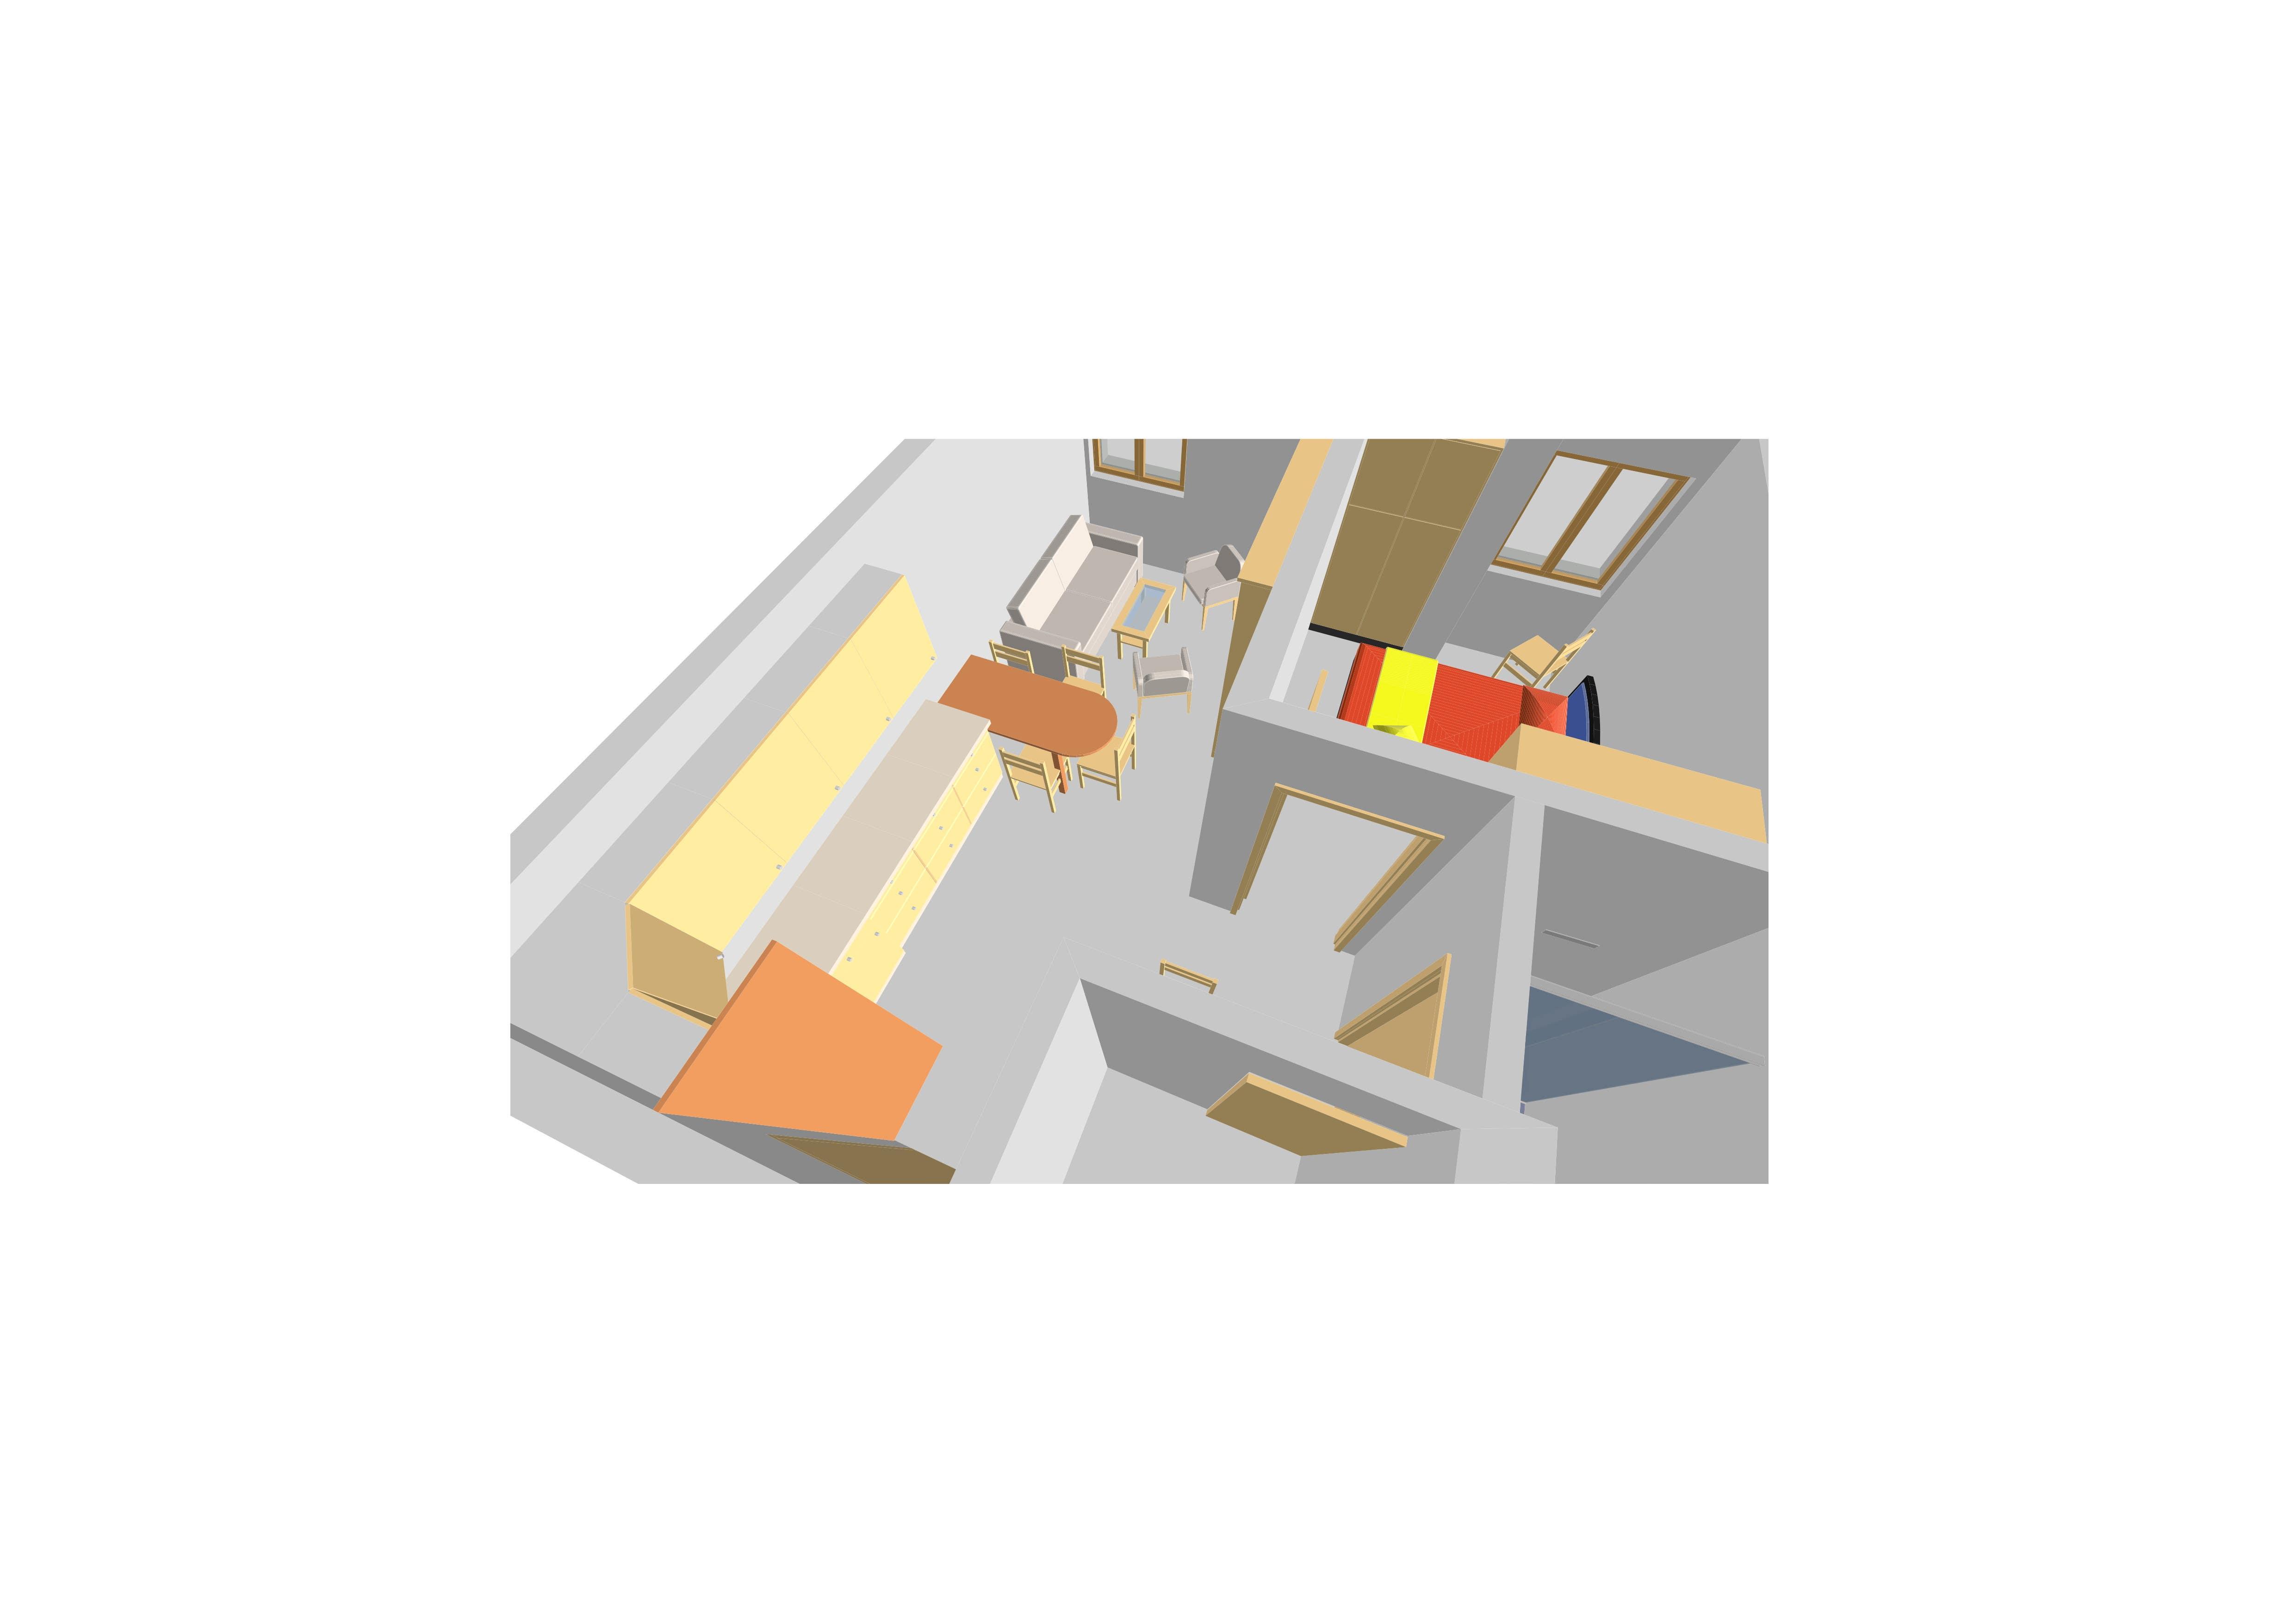 design of a flat